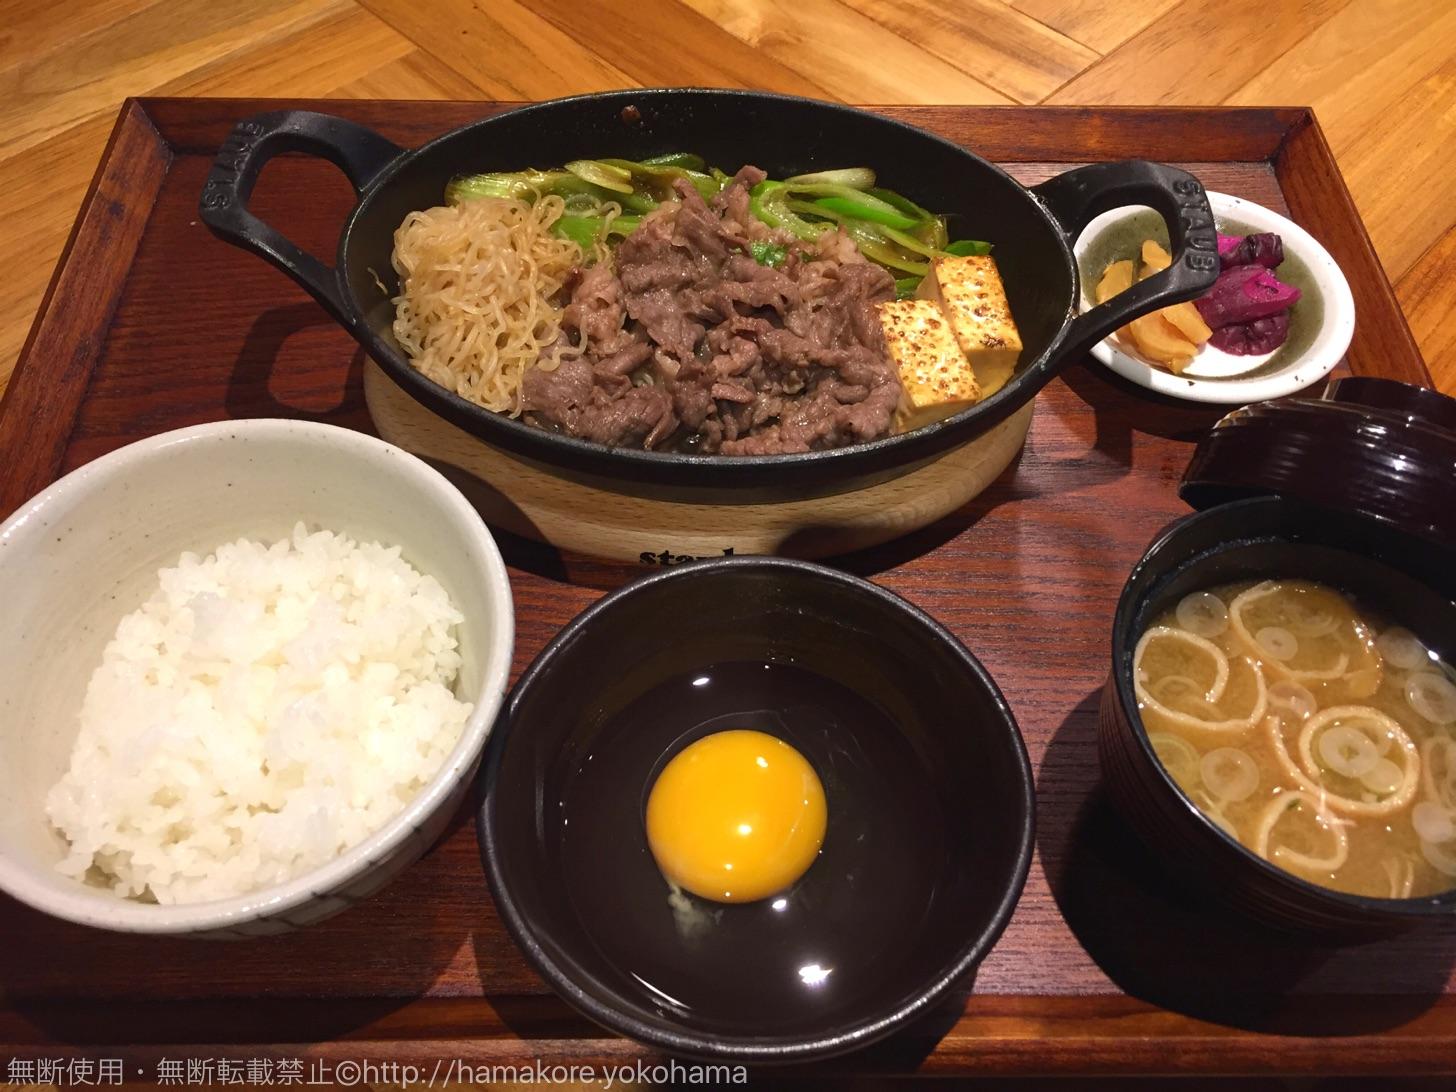 ARAIYA NEST(ネスト) 横浜駅でお手軽ランチ牛鍋!牛鍋老舗 荒井屋の新店舗